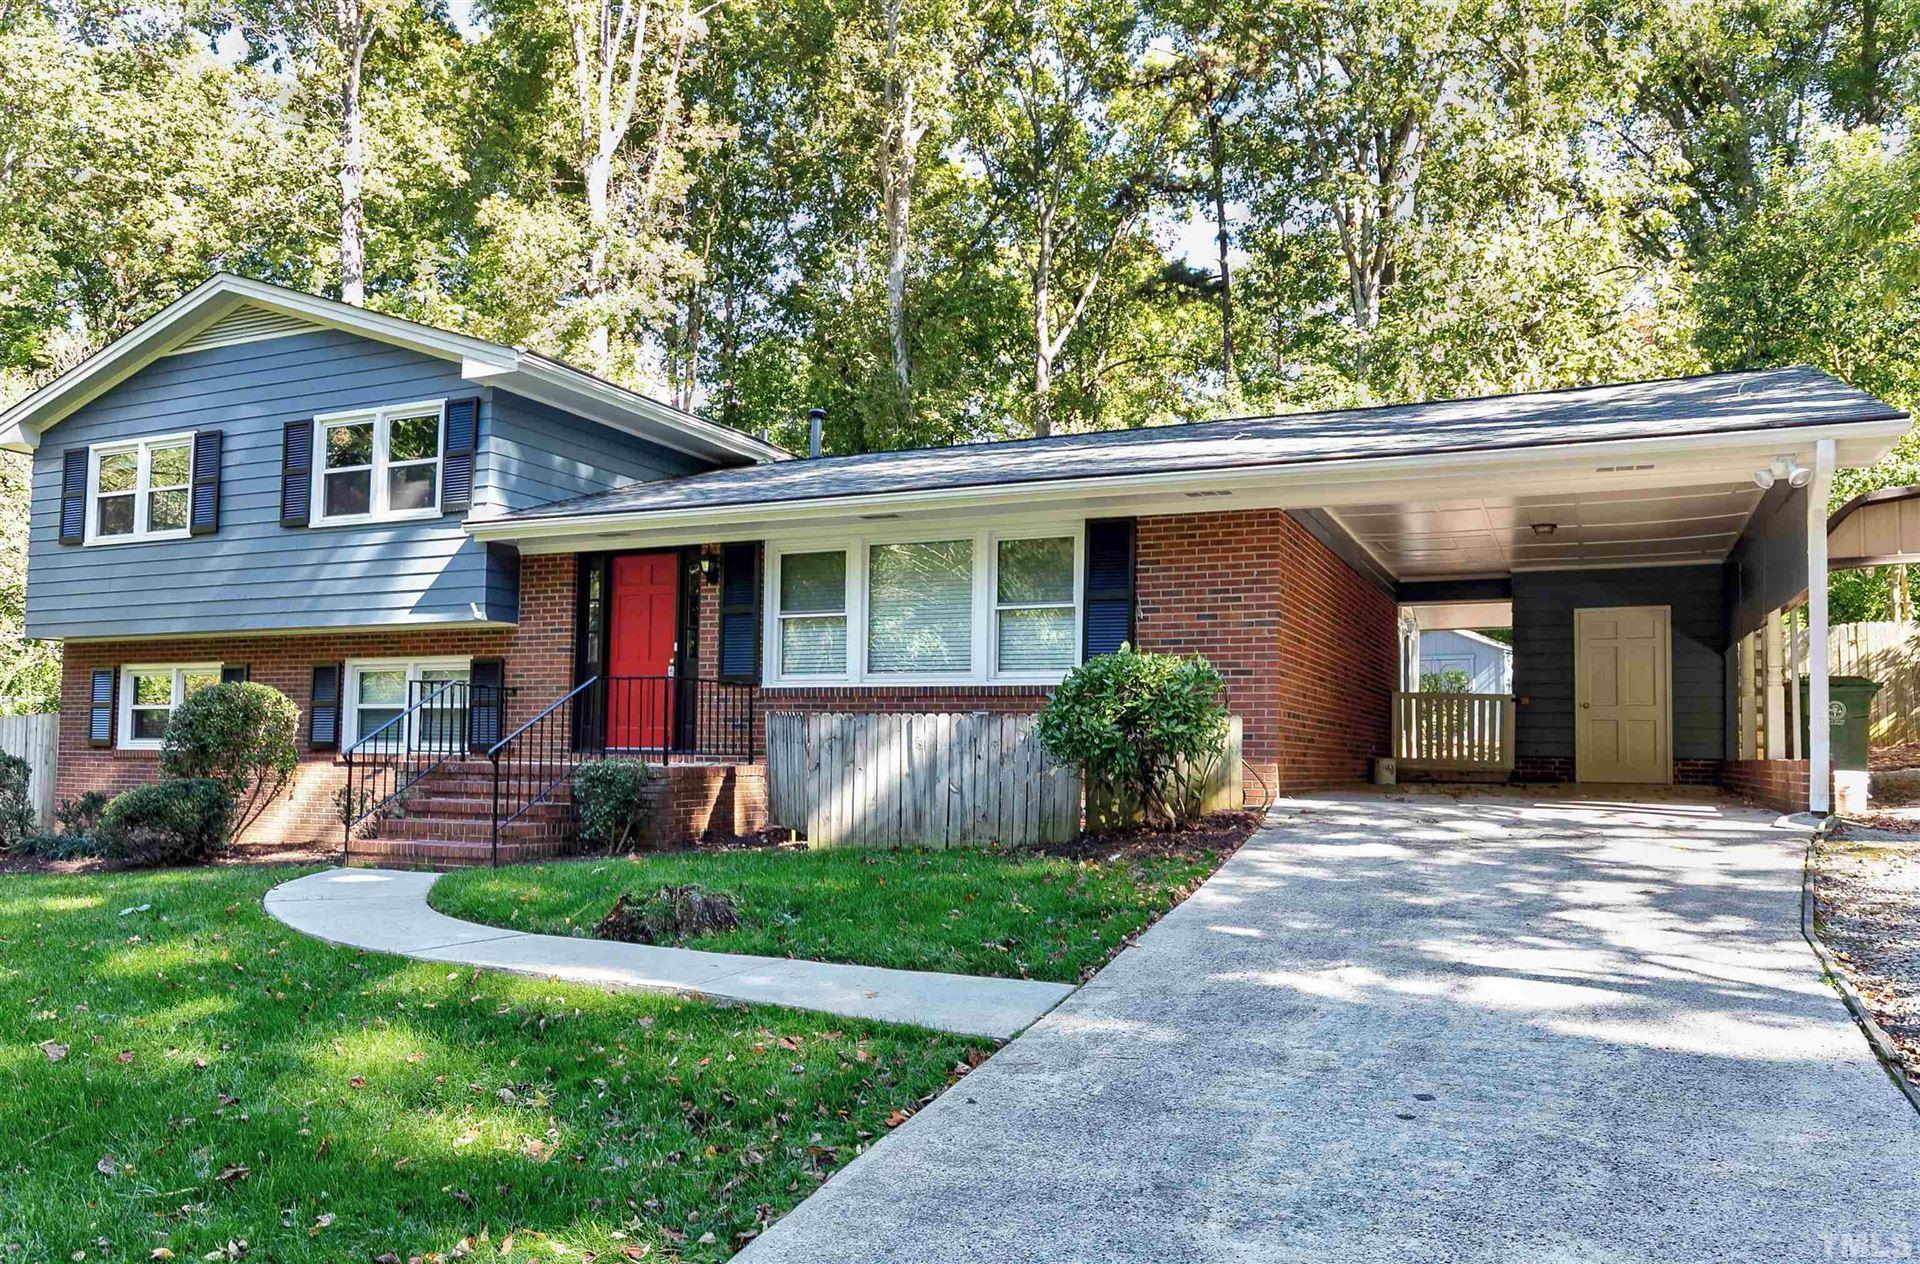 Photo of 1021 Tanglewood Drive, Cary, NC 27511 (MLS # 2415593)